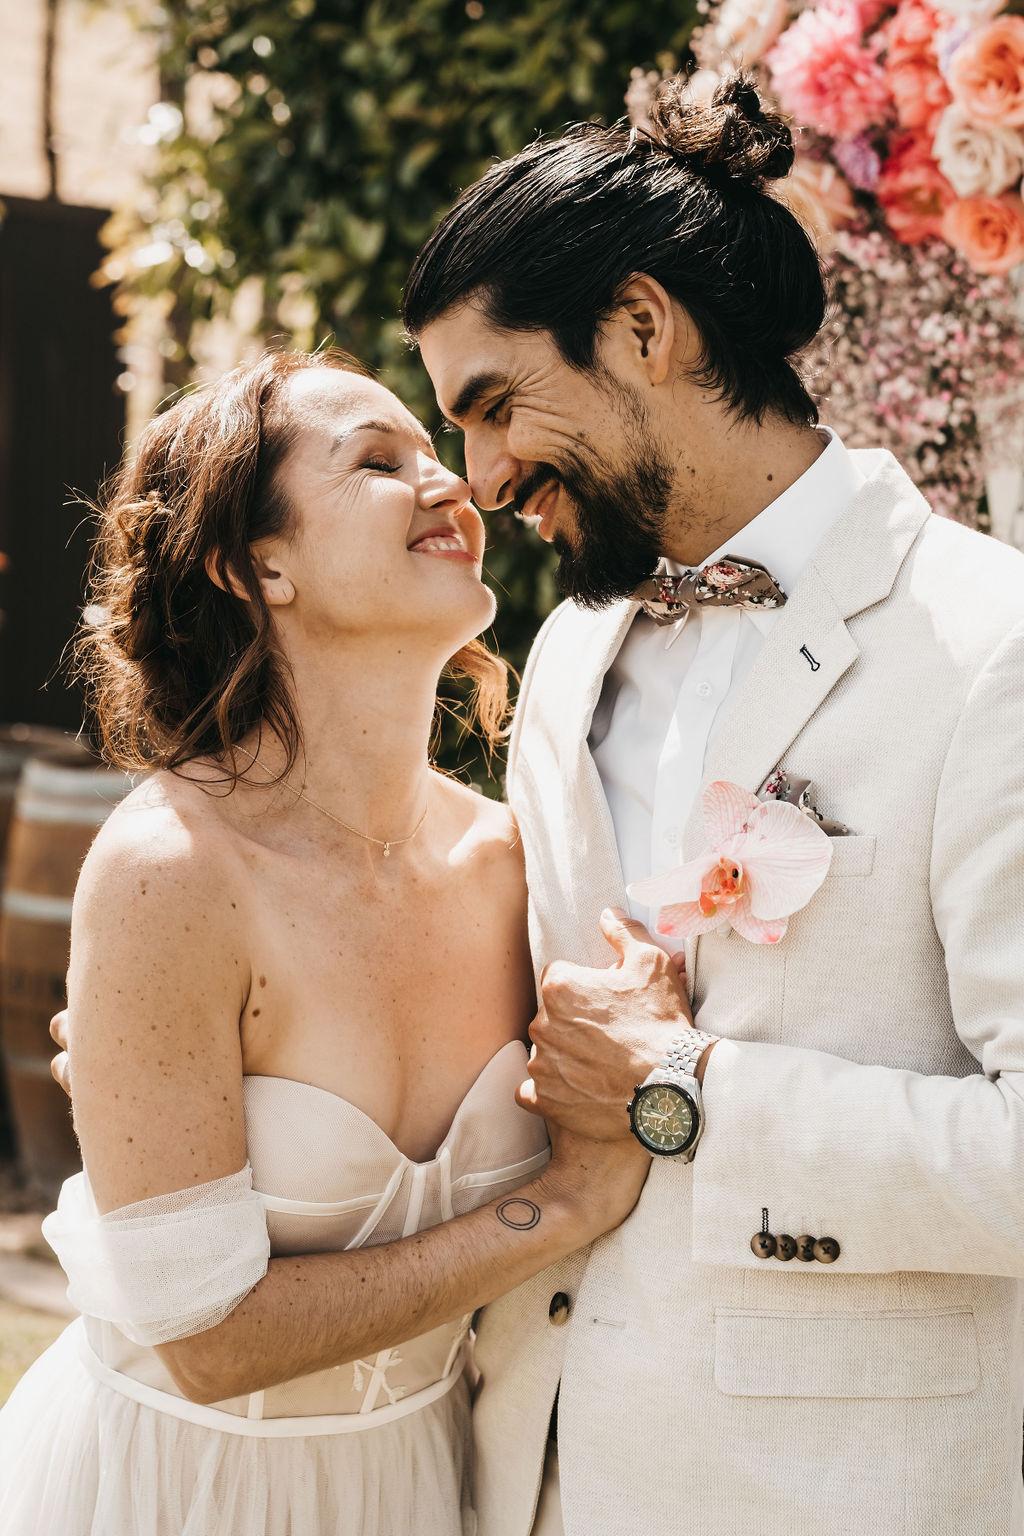 ABUNDANTLY PINK TEXTURAL WEDDING STYLING